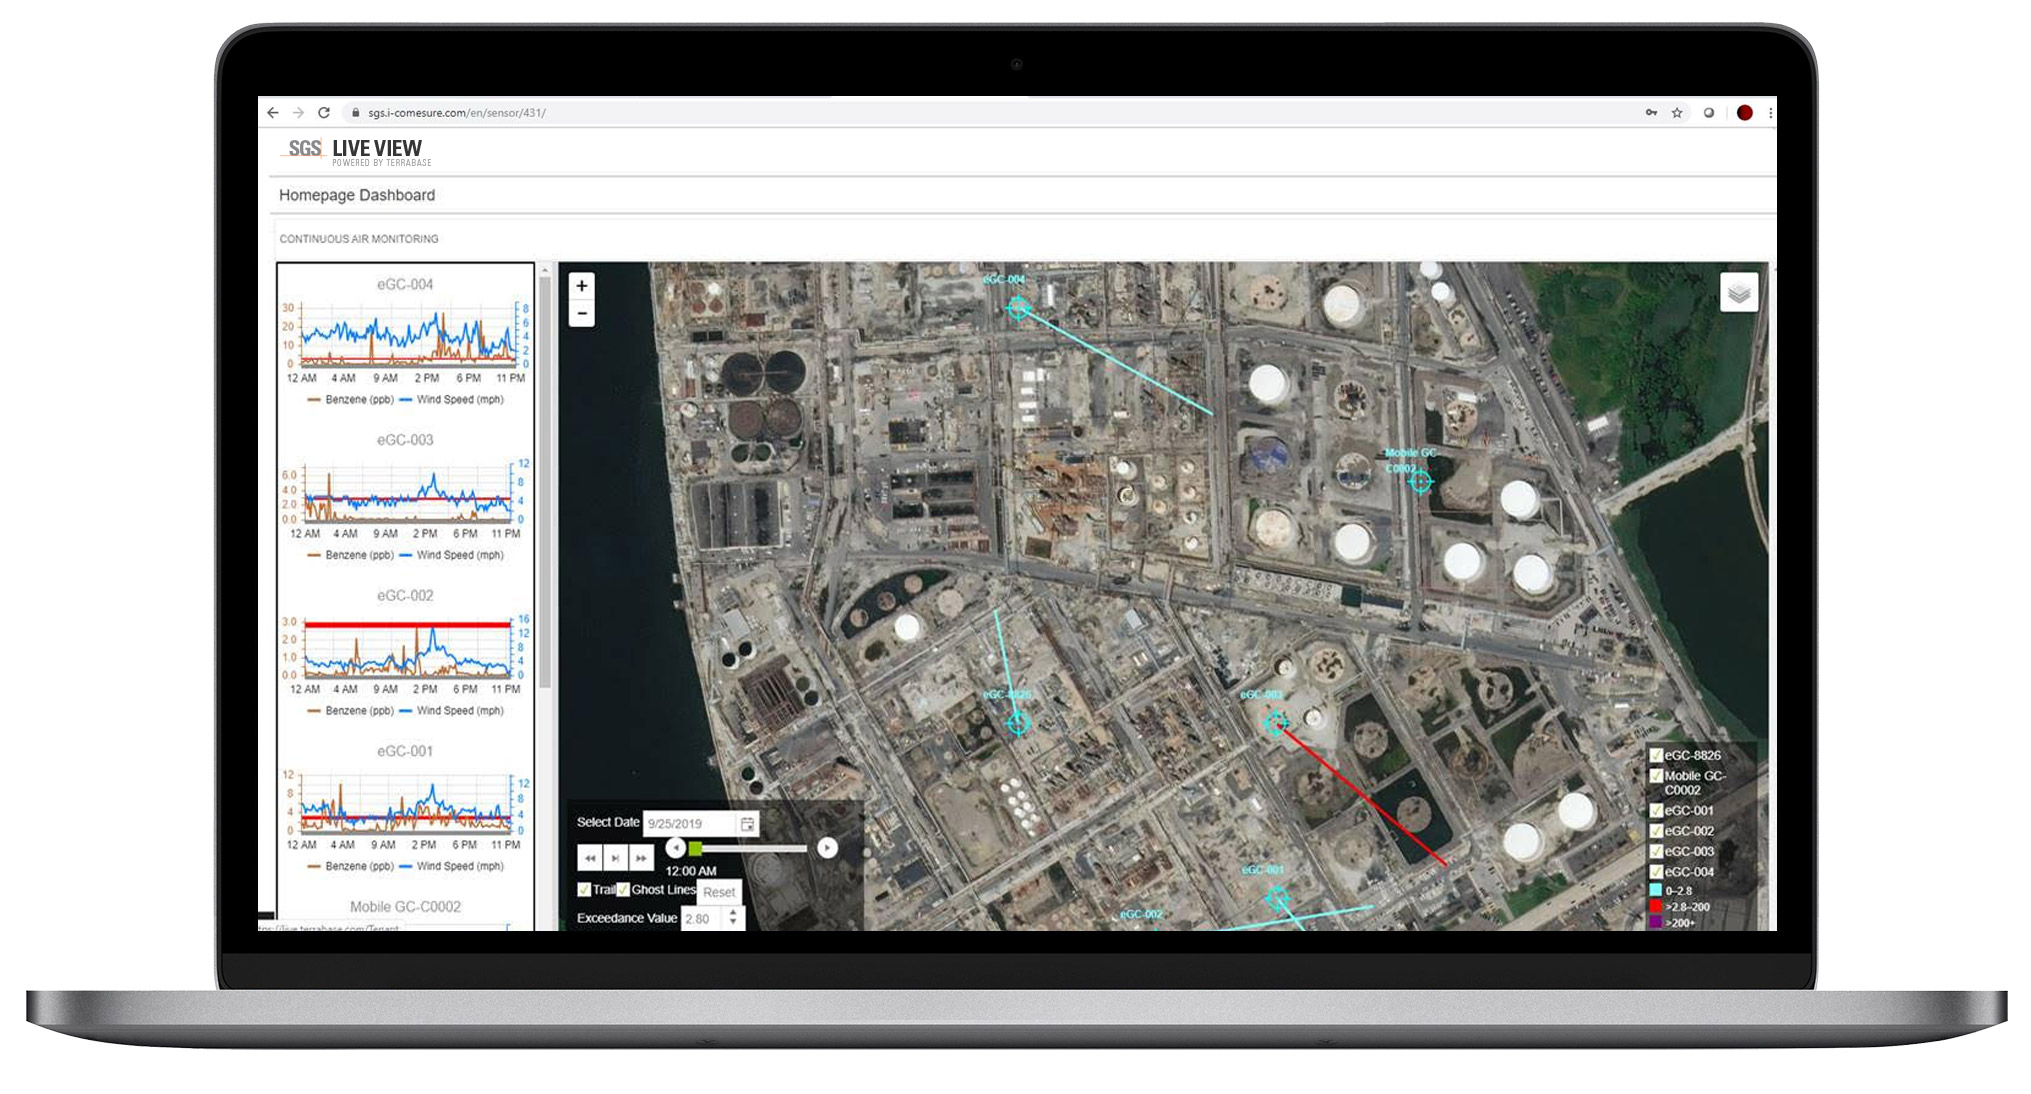 SGS SmartSense Live View - Dashboard